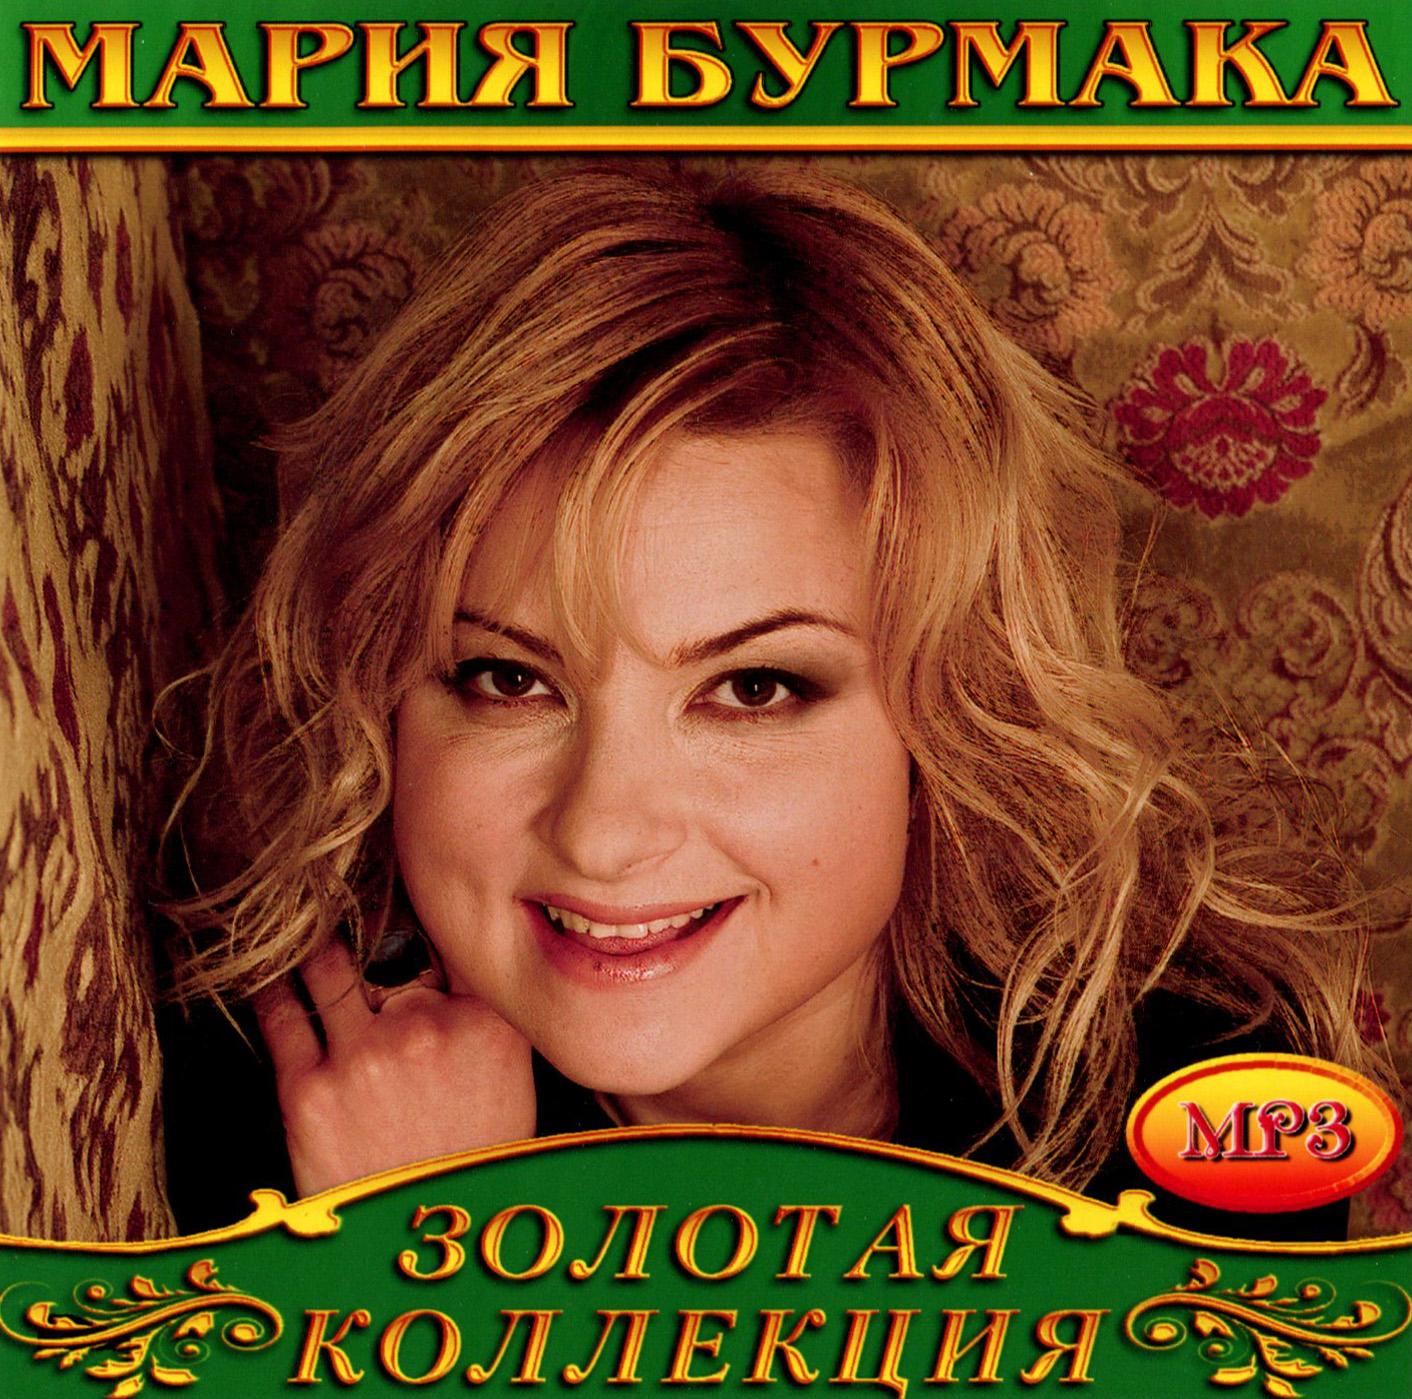 Марія Бурмака [mp3]